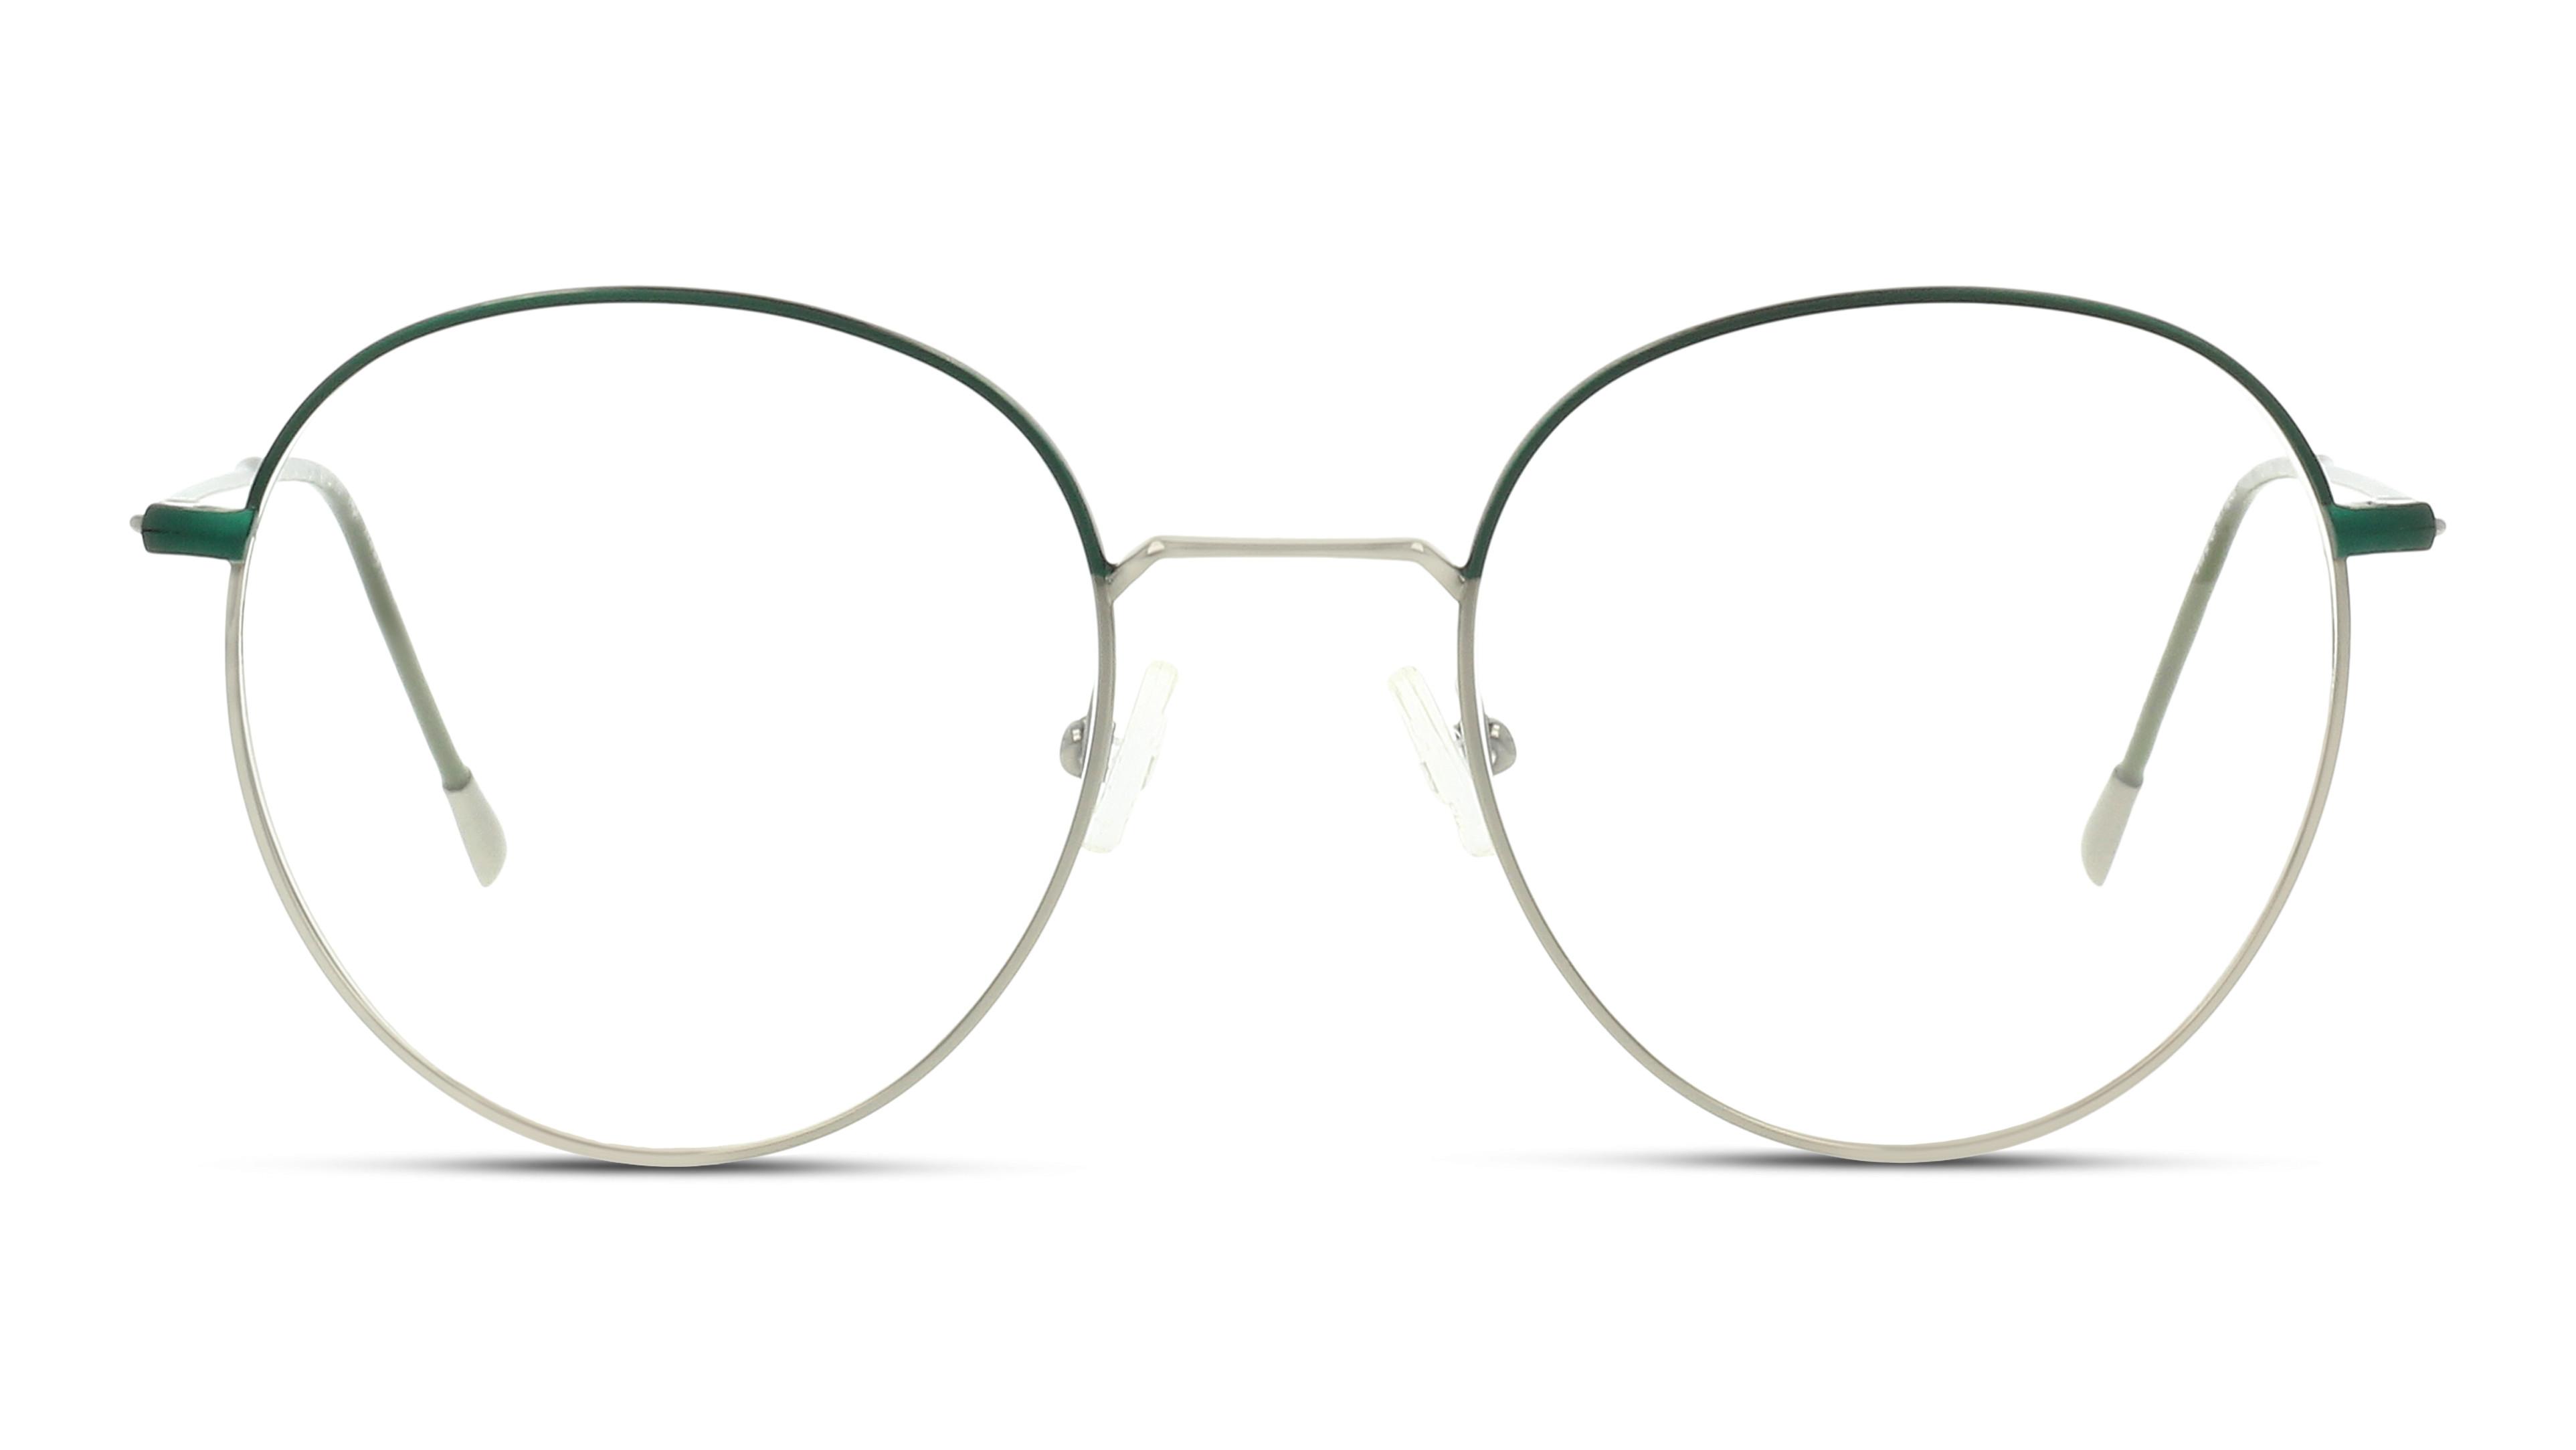 8719154583919-front-01-fuzion-fukm11-eyewear-grey-green